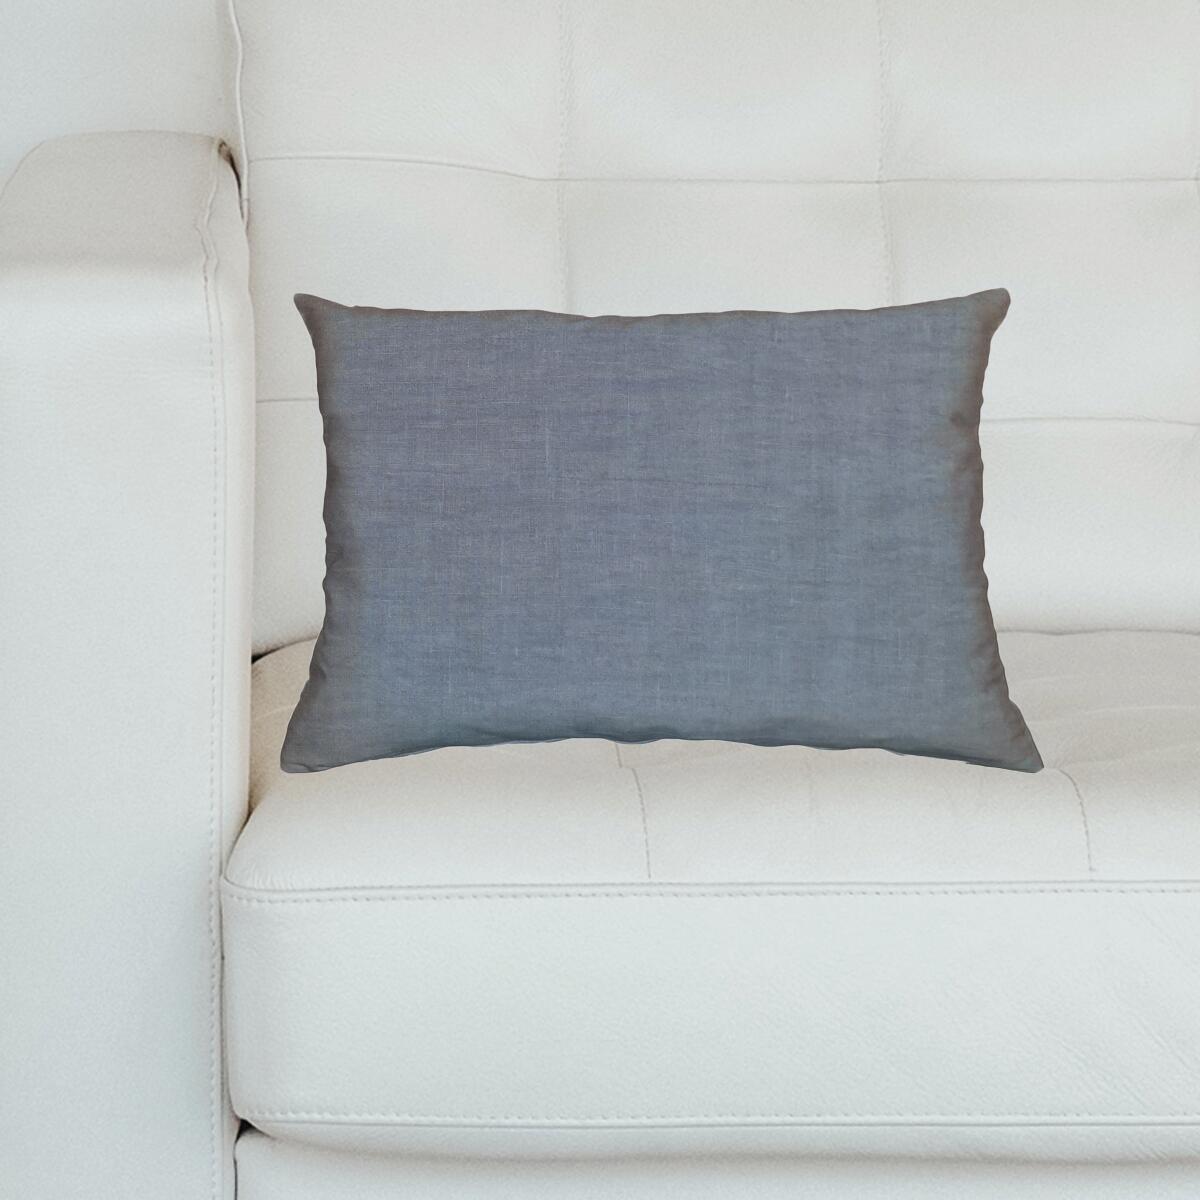 Cuscino Lino viola 40x60 cm - 3